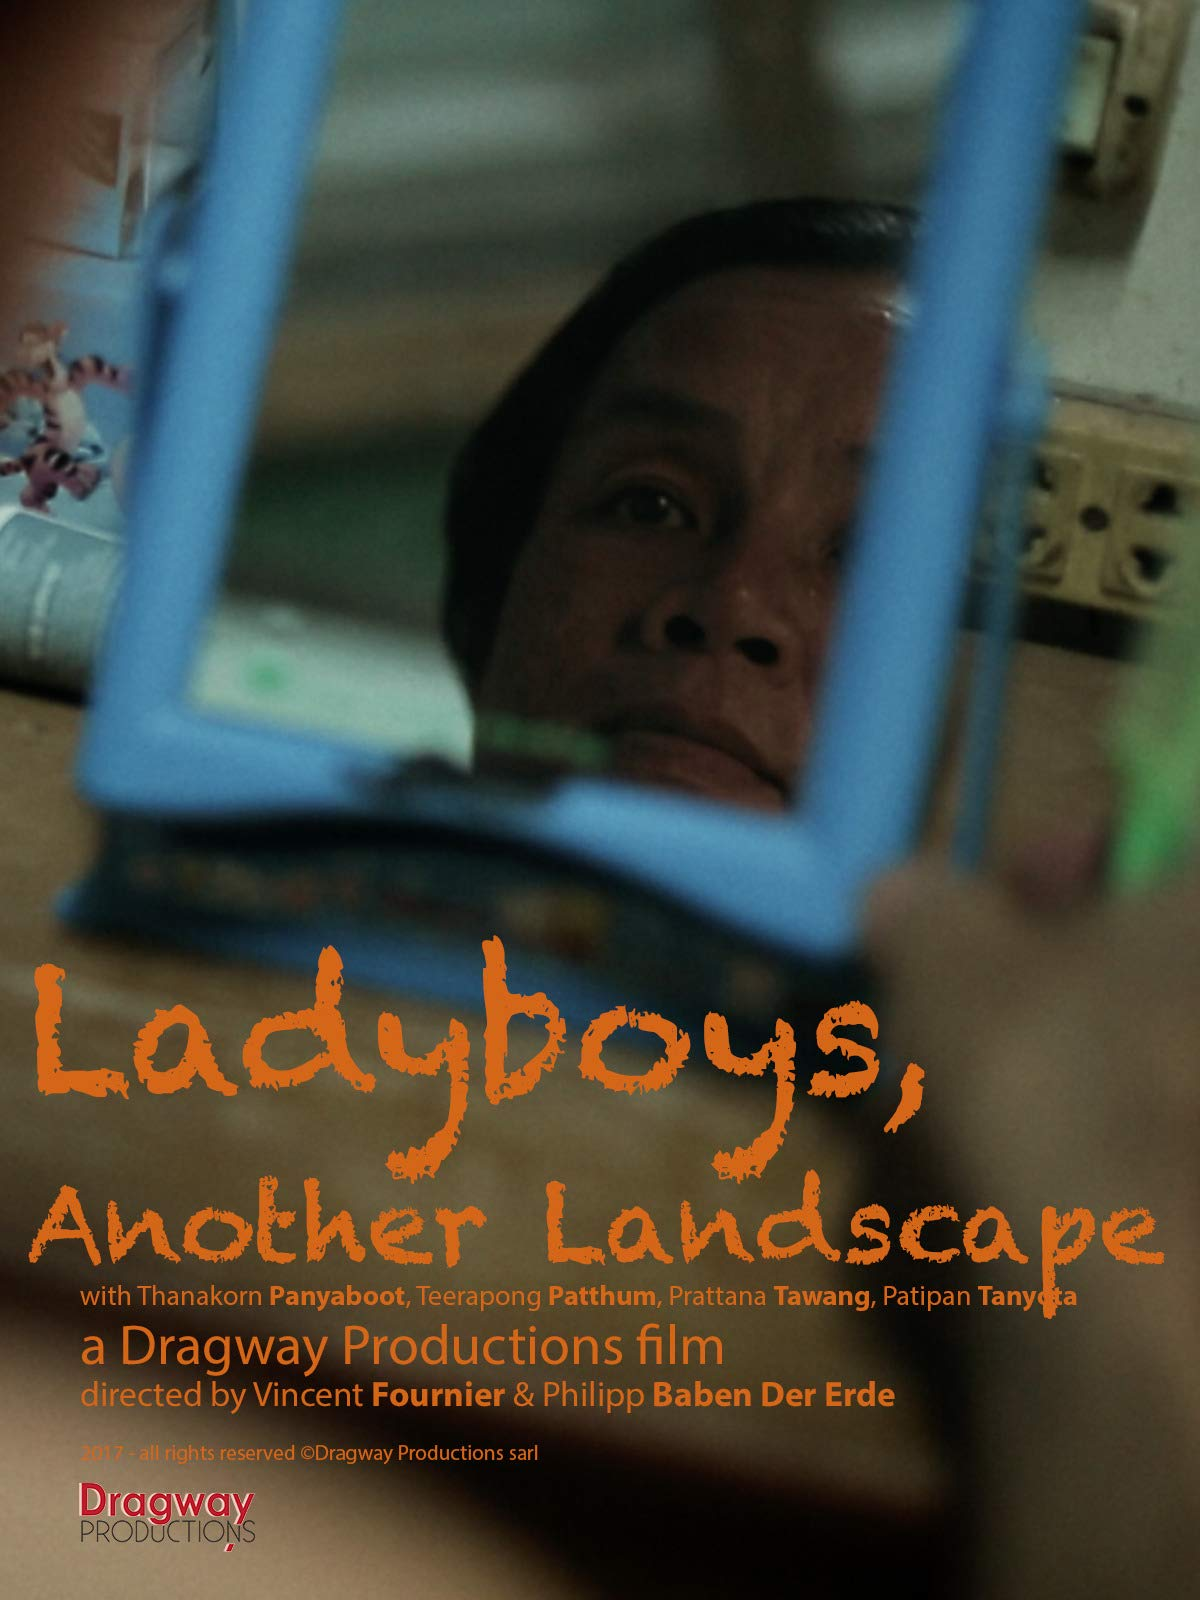 Ladyboys, Another Landscape